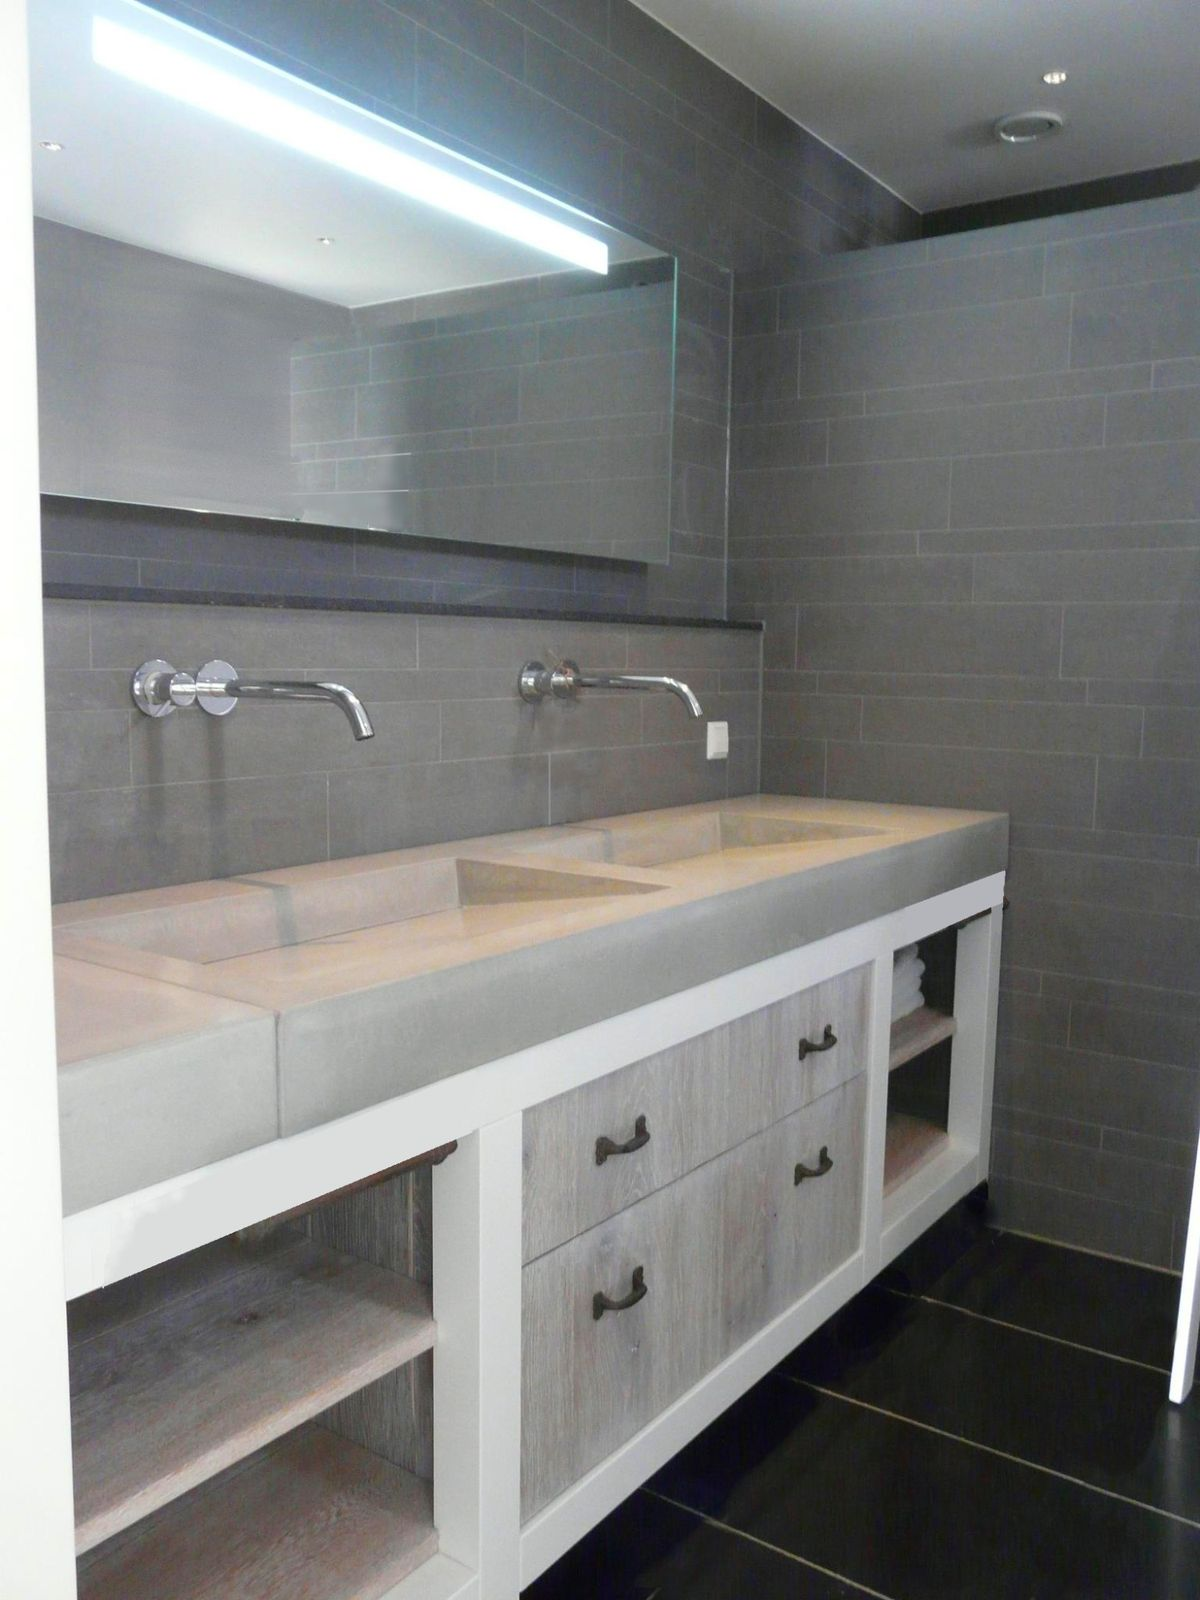 Plan de travail en teck pour salle de bain maison design - Plan de travail sur mesure salle de bain ...